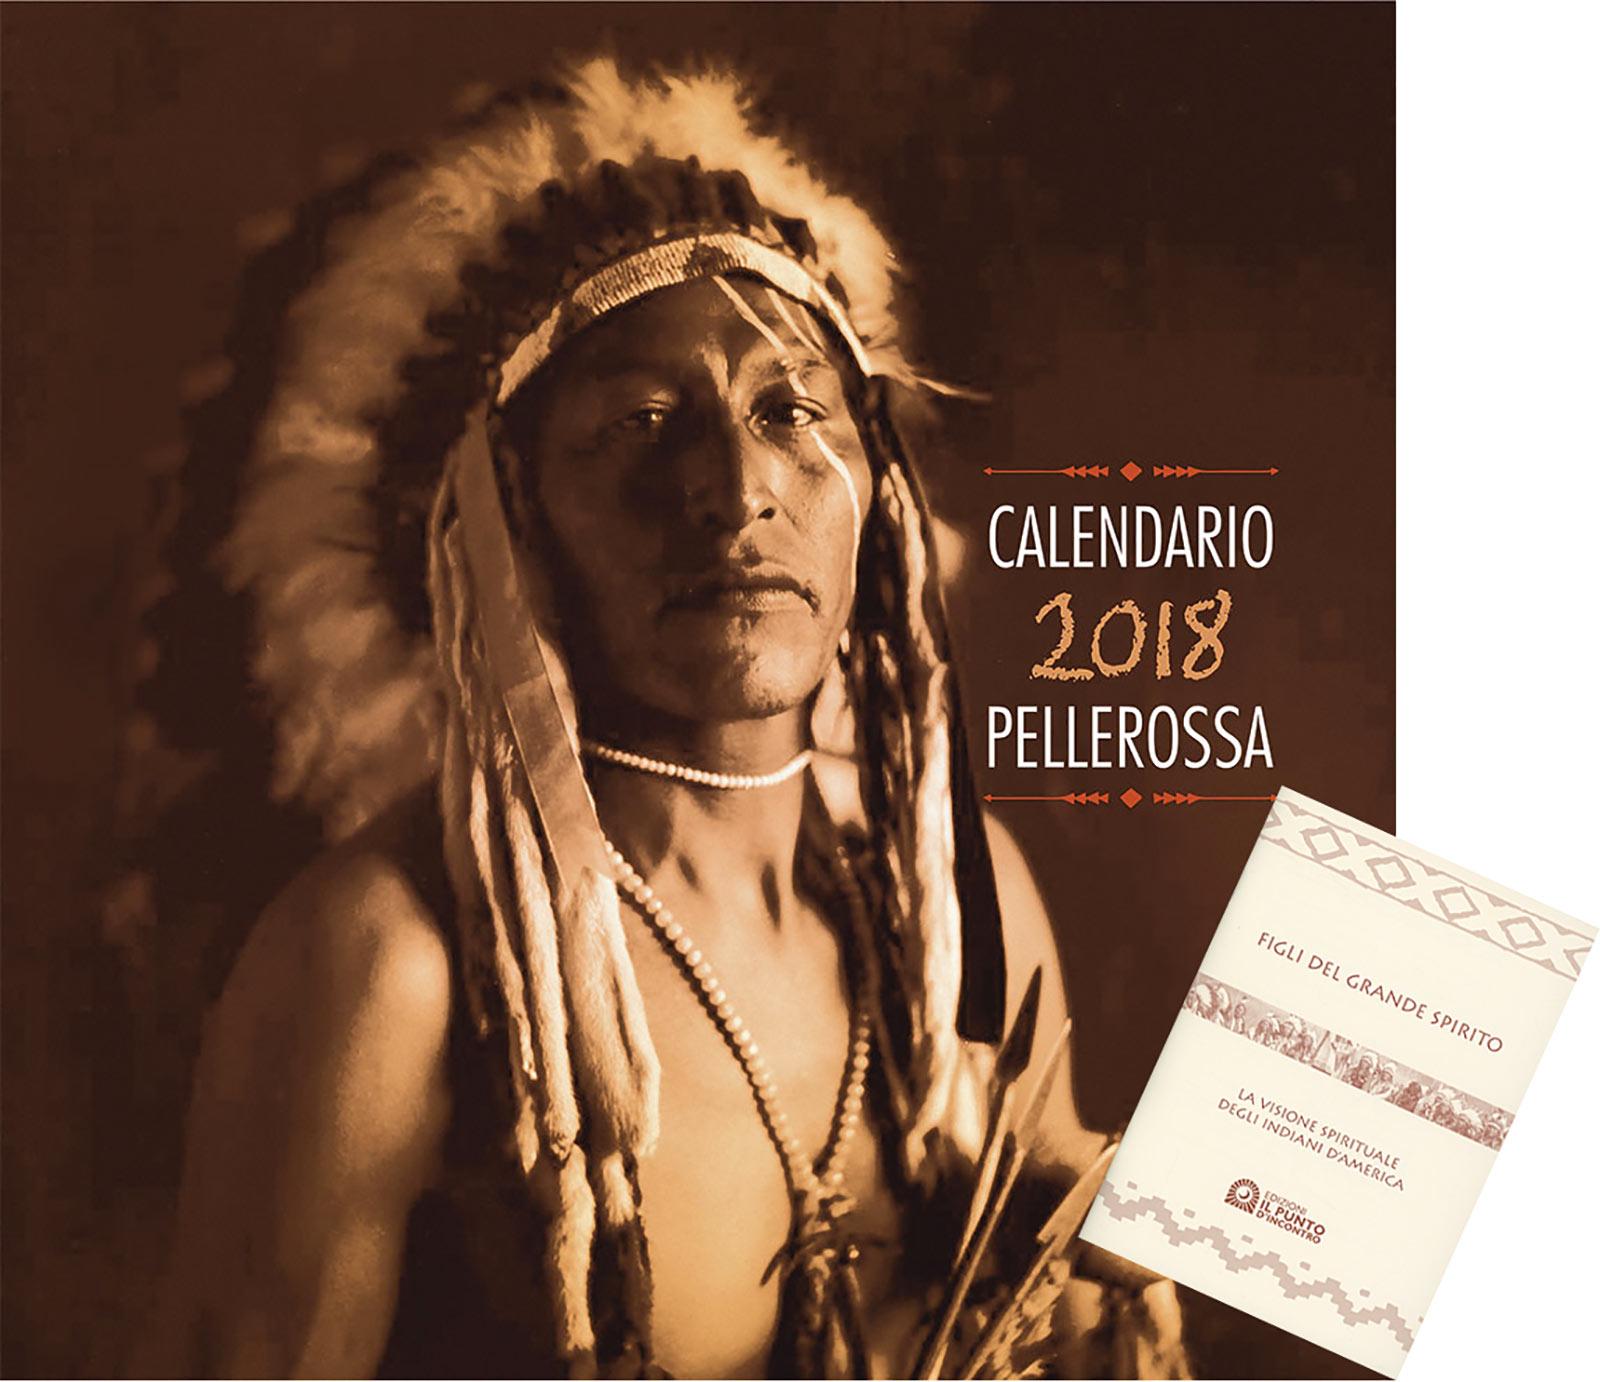 Calendario Pellerossa 2018 + Libro